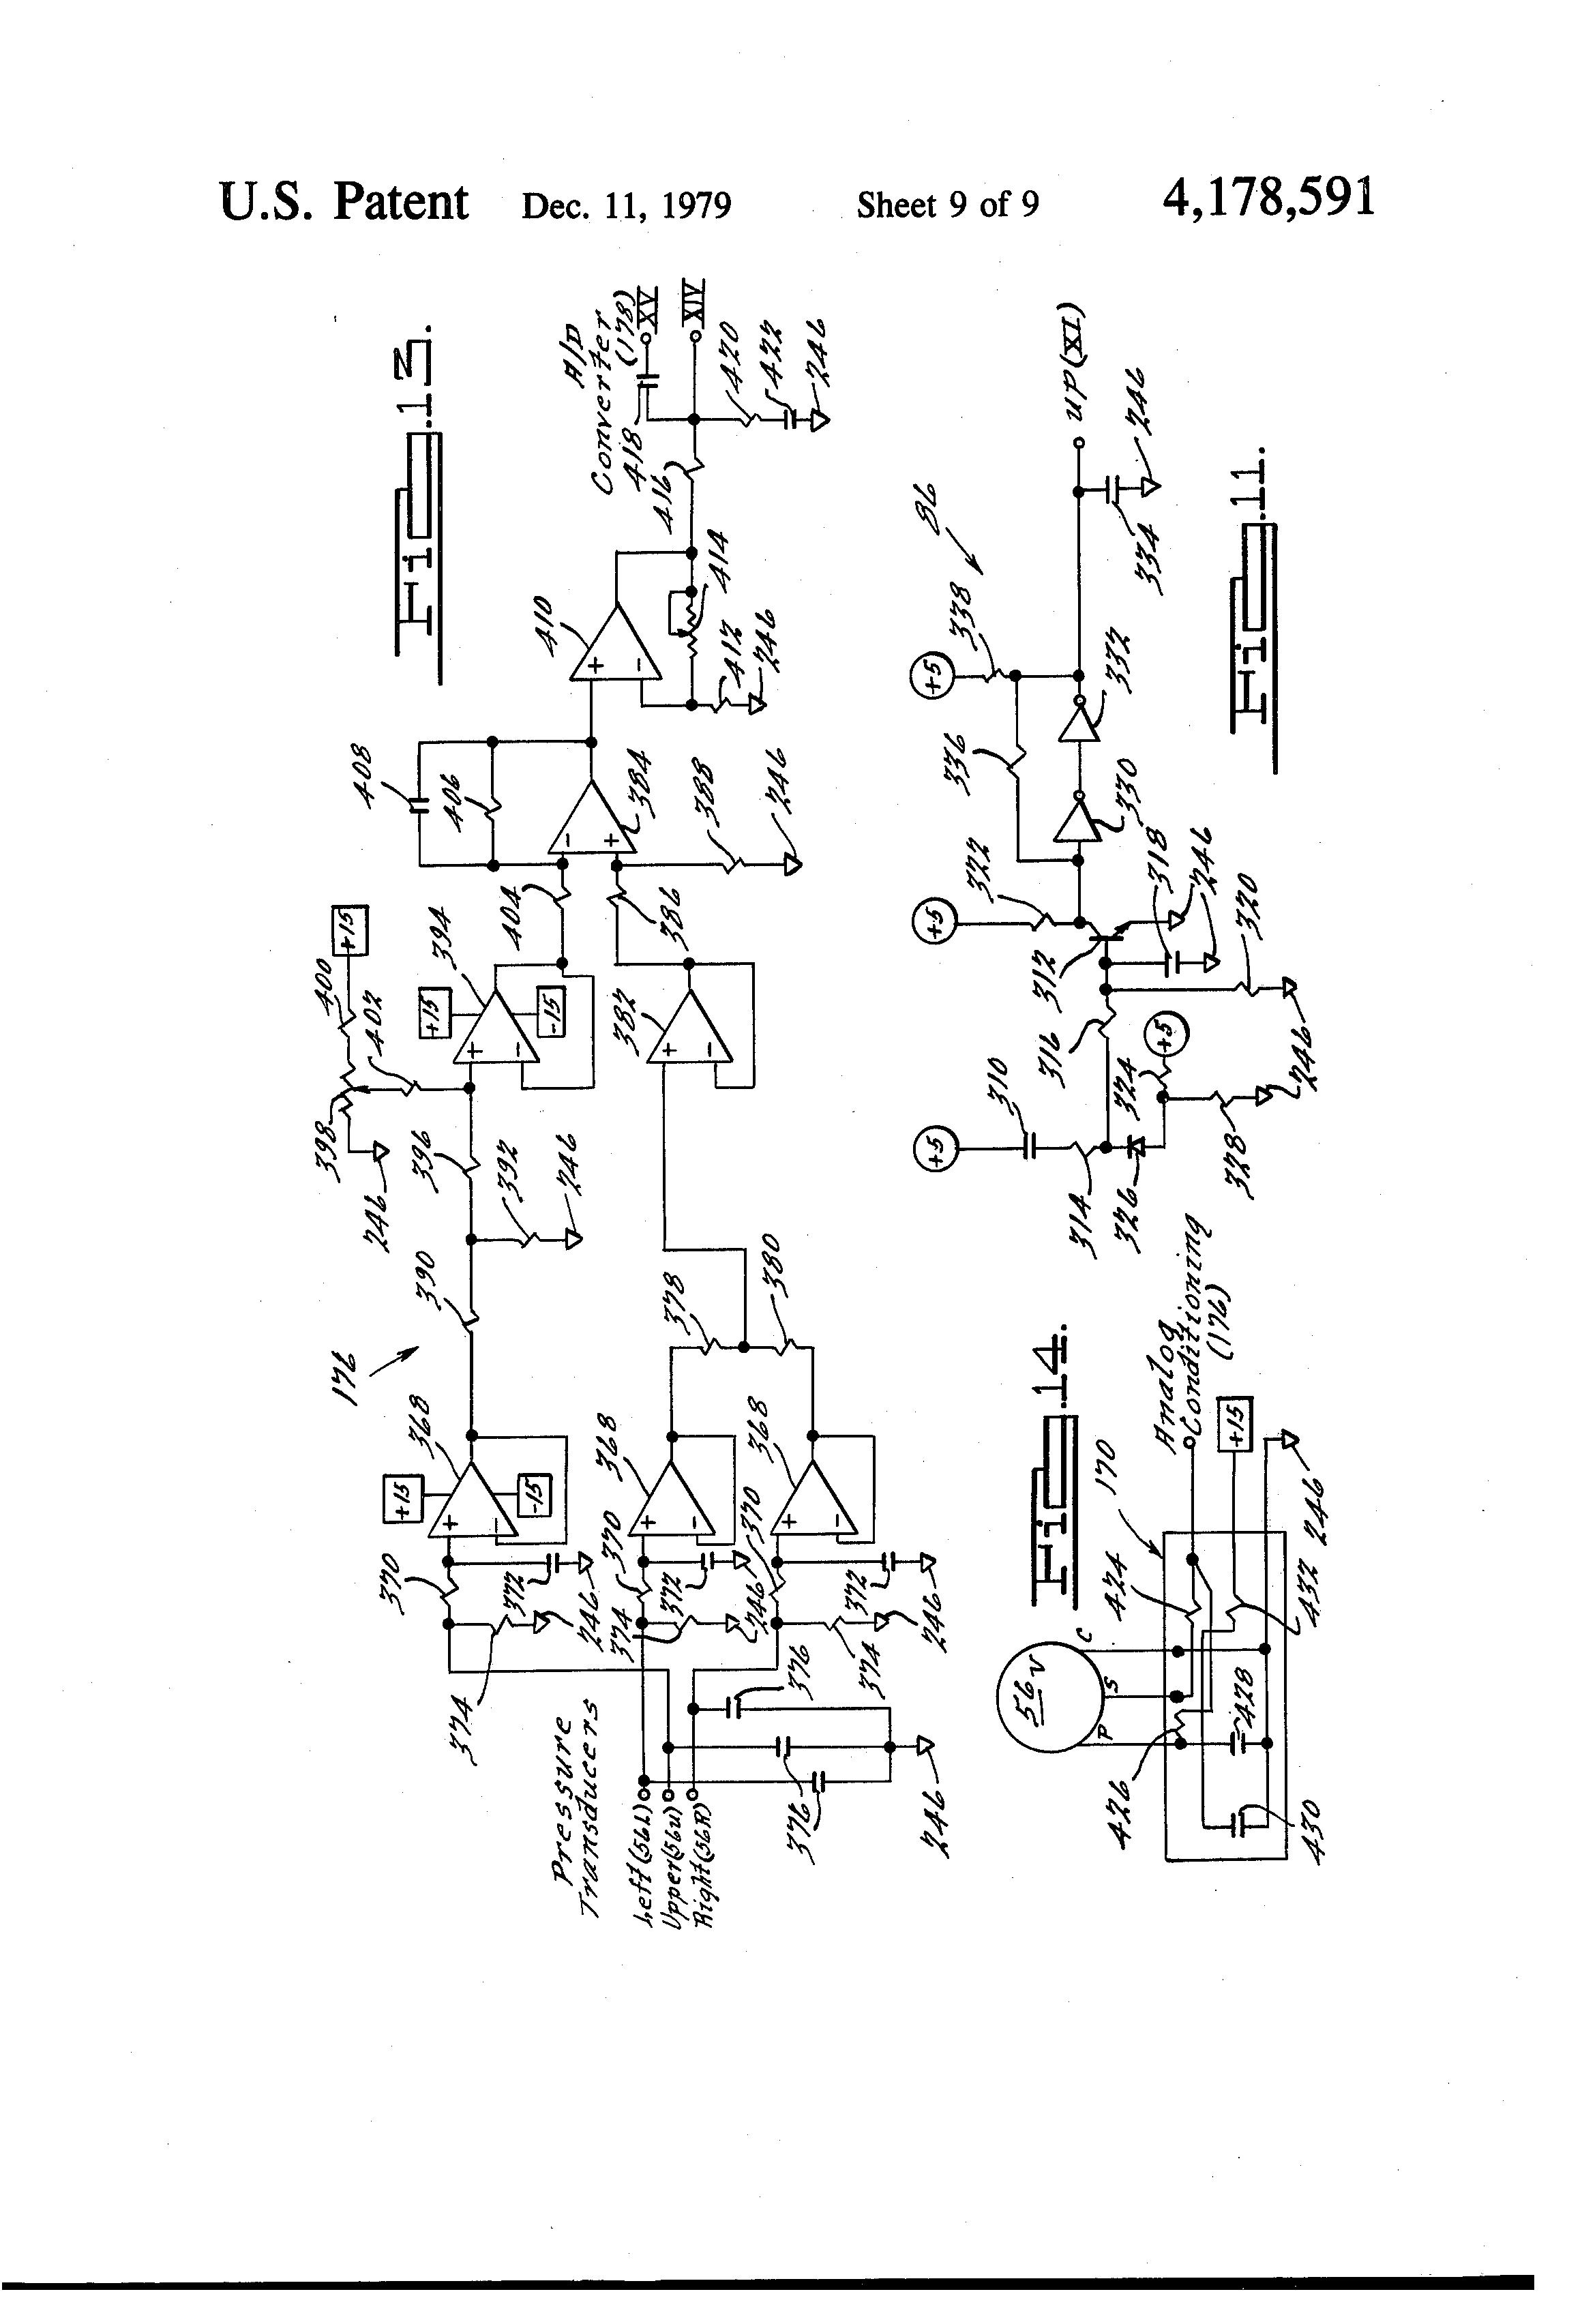 Shaw Box Hoist Wiring Diagram 29 Wiring Diagram Images